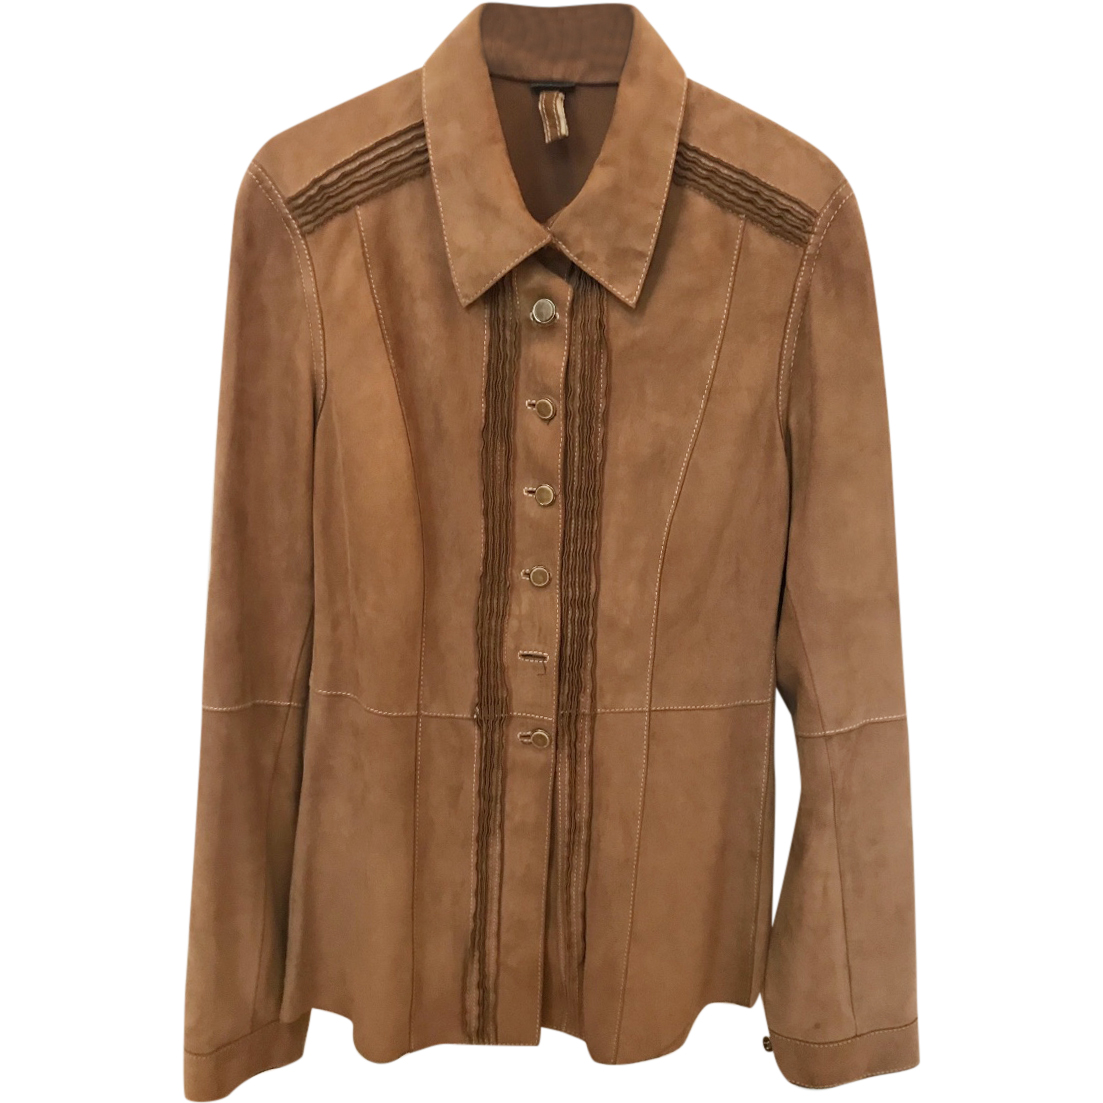 Mabrun brown suede shirt